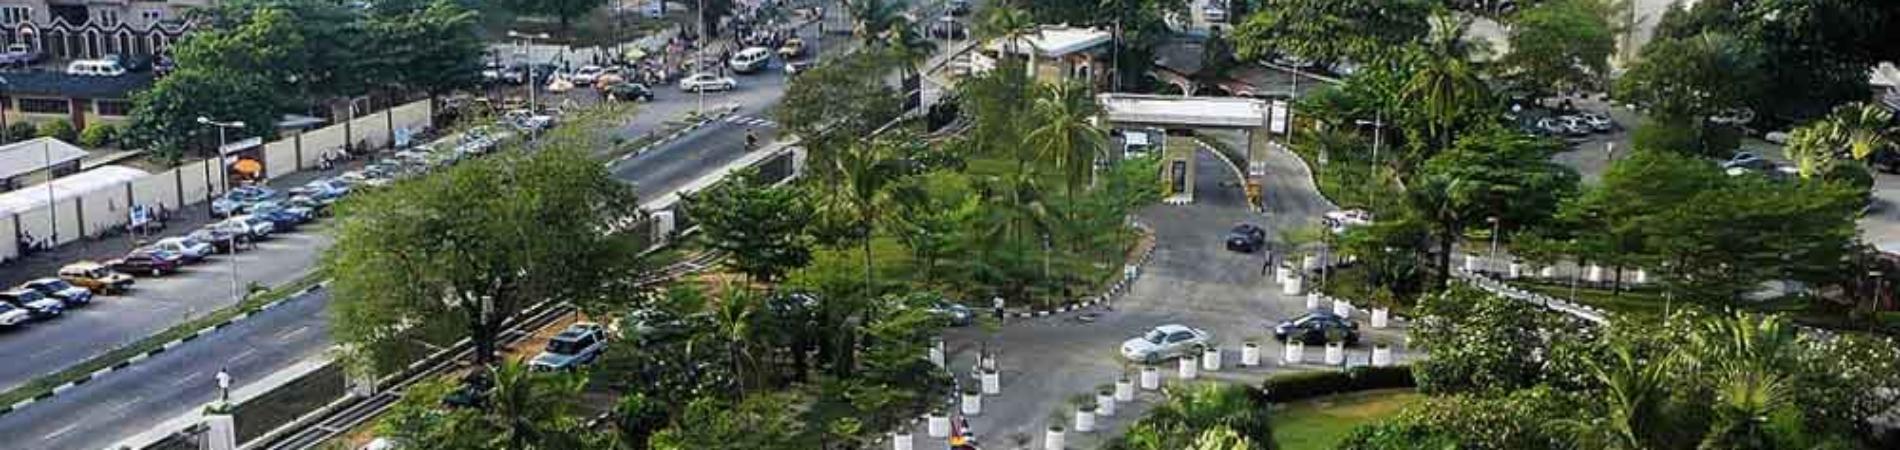 FCT Abuja City, Nigeria